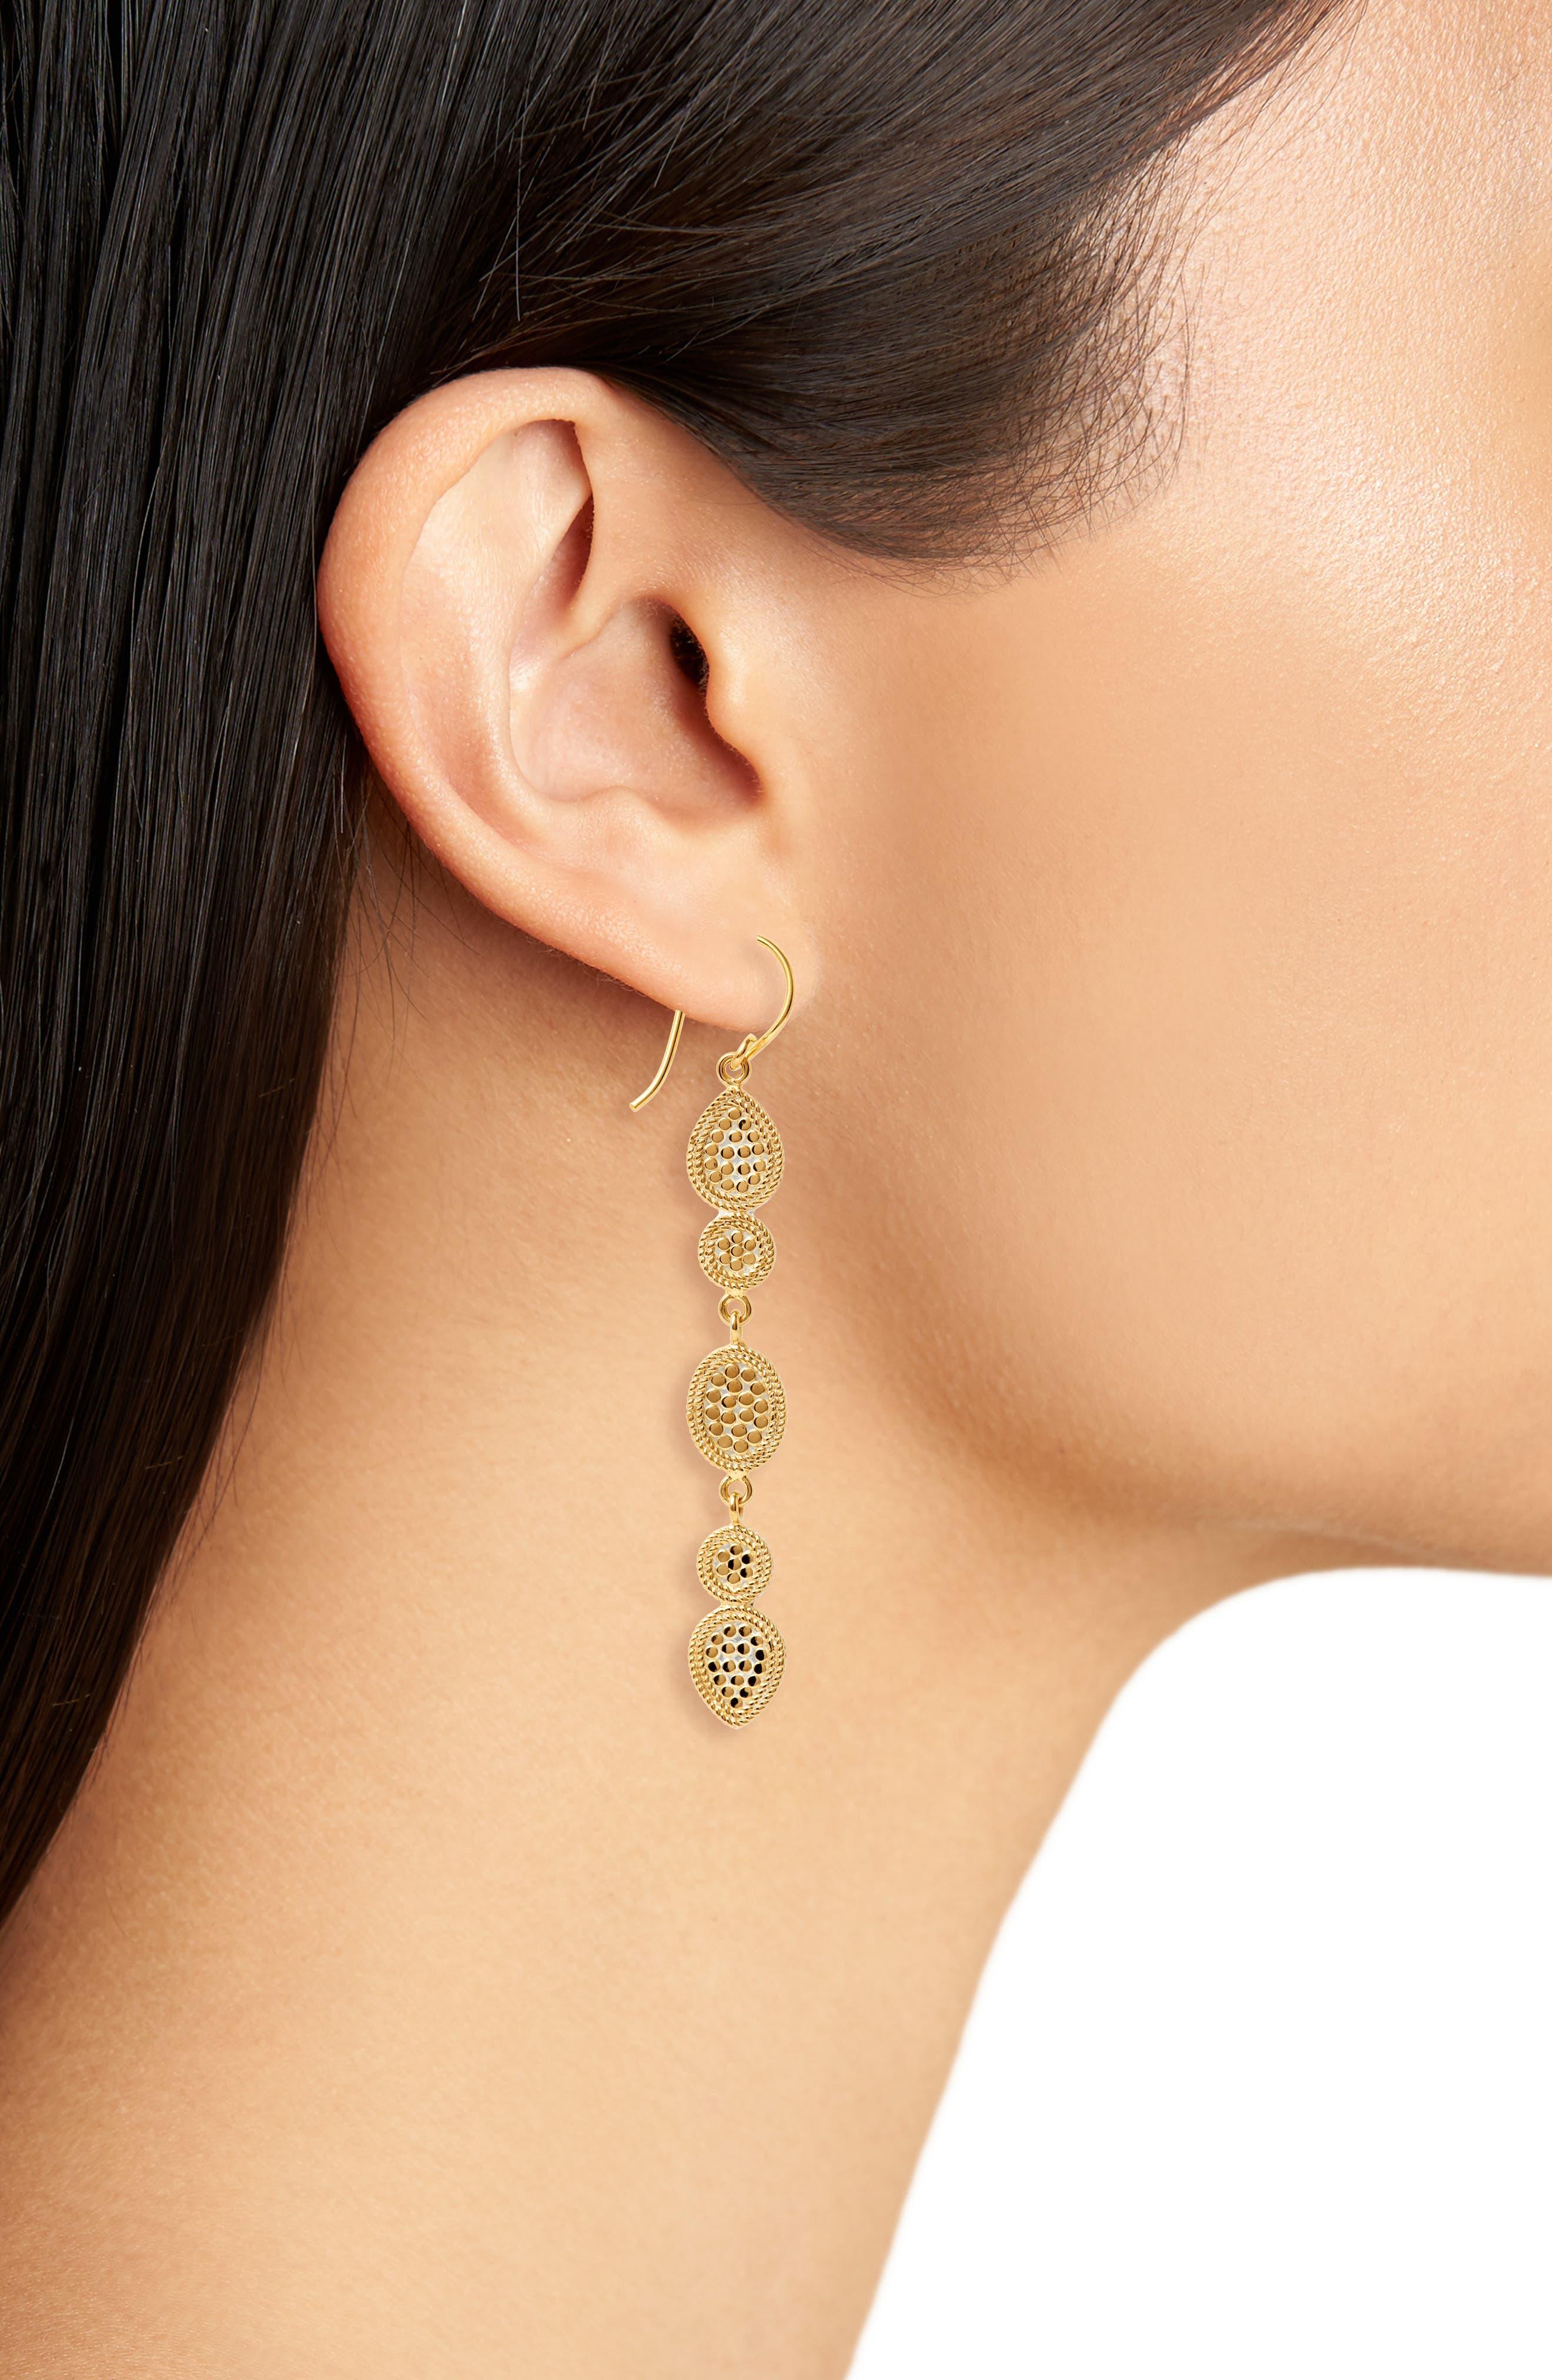 Gold Multidisc Linear Drop Earrings,                             Alternate thumbnail 2, color,                             GOLD